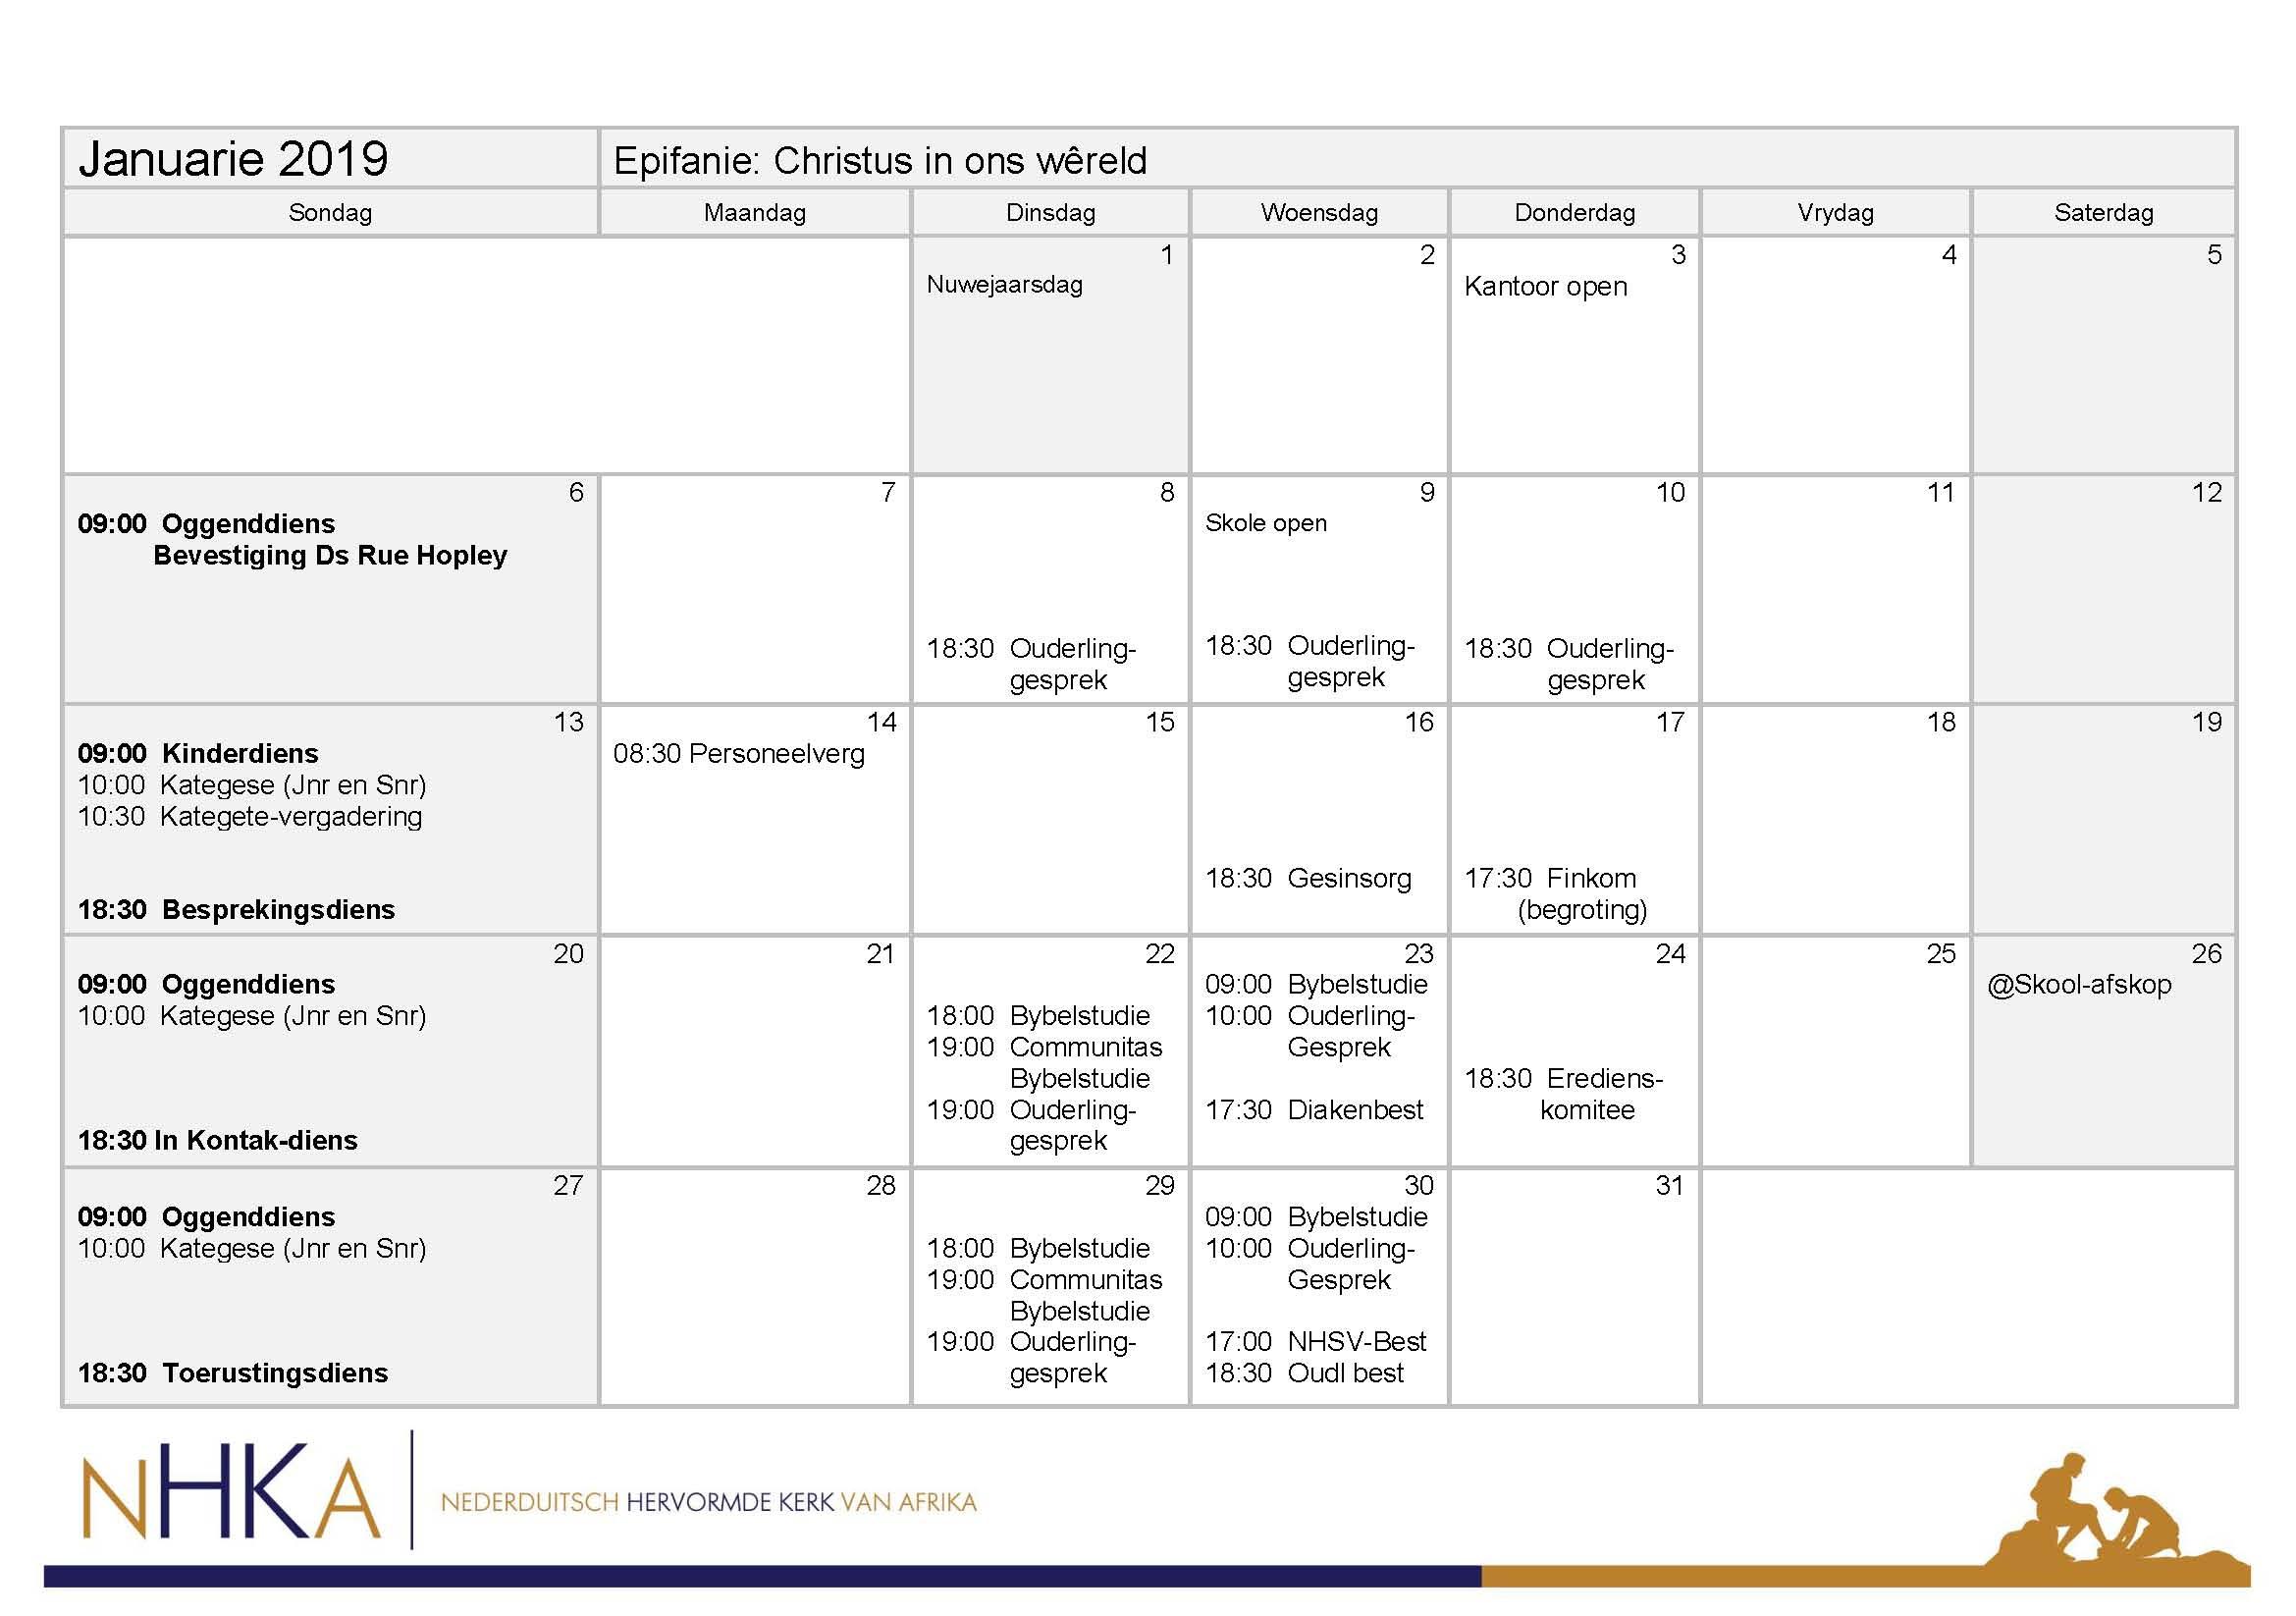 nhka 2019 Pretoria-Oos kalender_Page_01.jpg